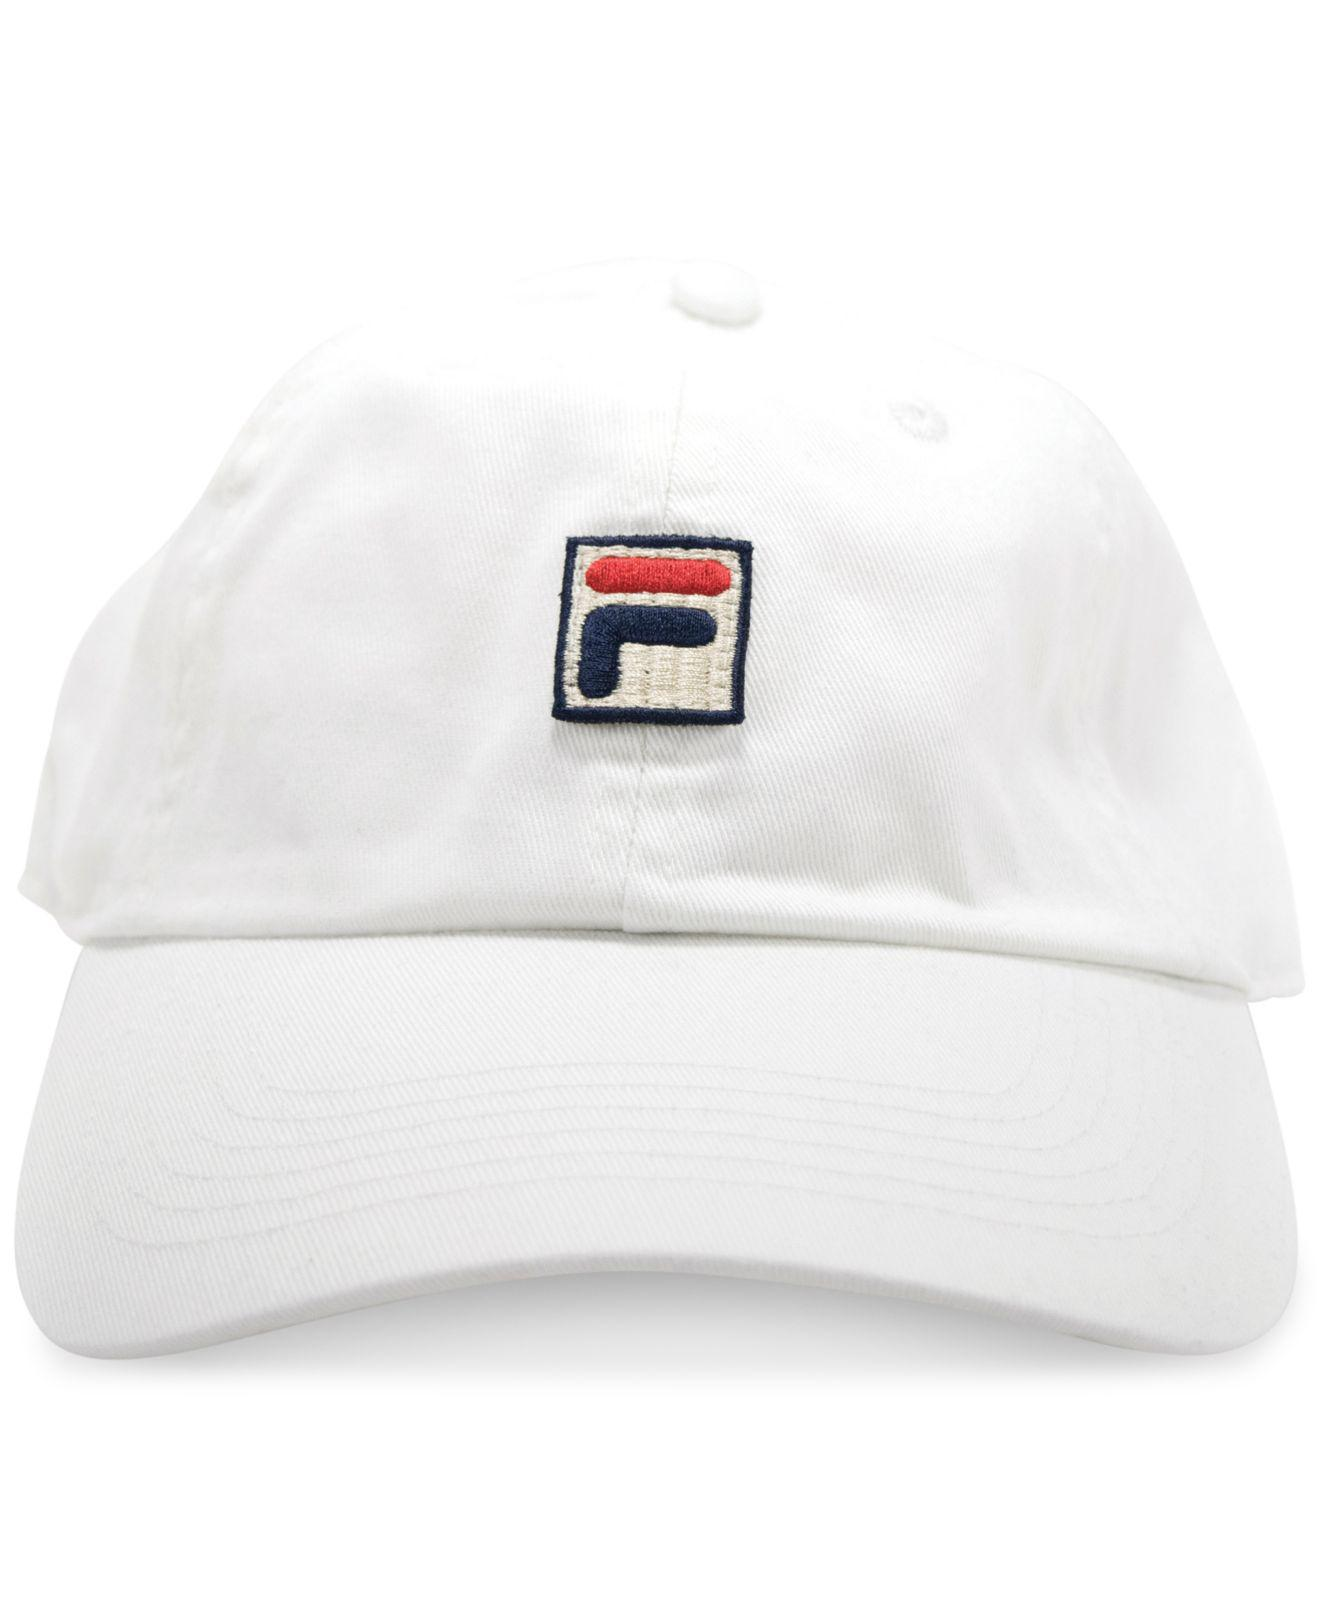 Lyst - Fila Heritage Cotton Baseball Cap in White f377187b1beb